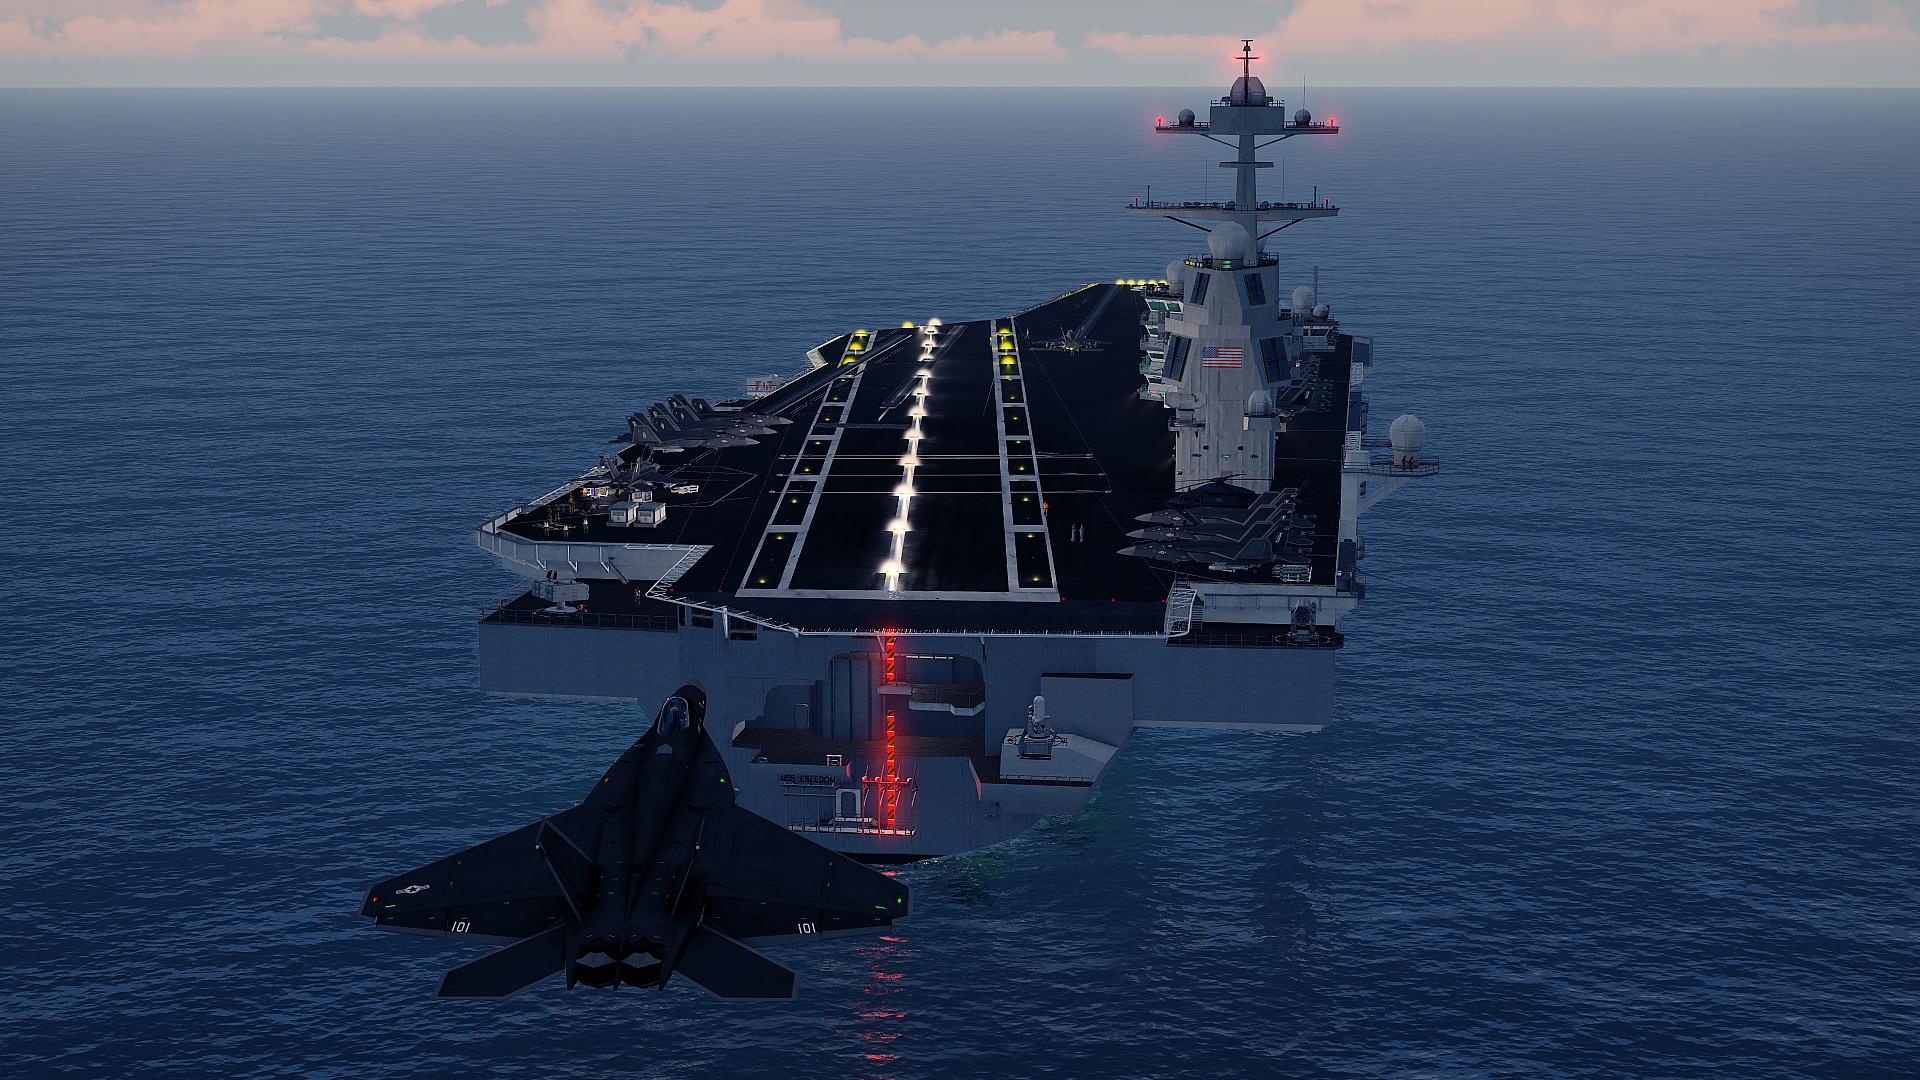 Armu 3 obohatí letadlová loď 142198